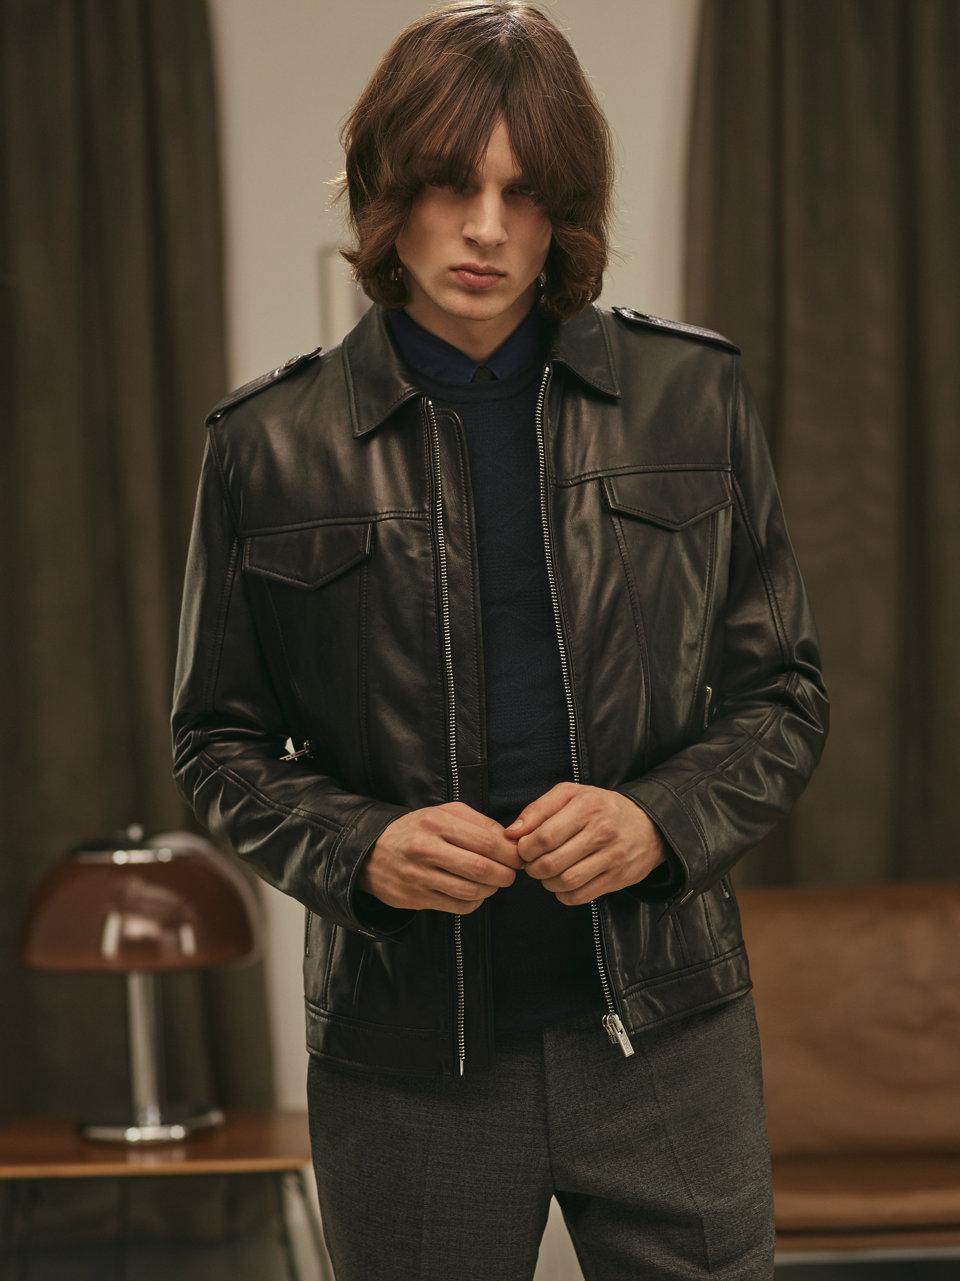 The model wears a black leather jacket byHUGO